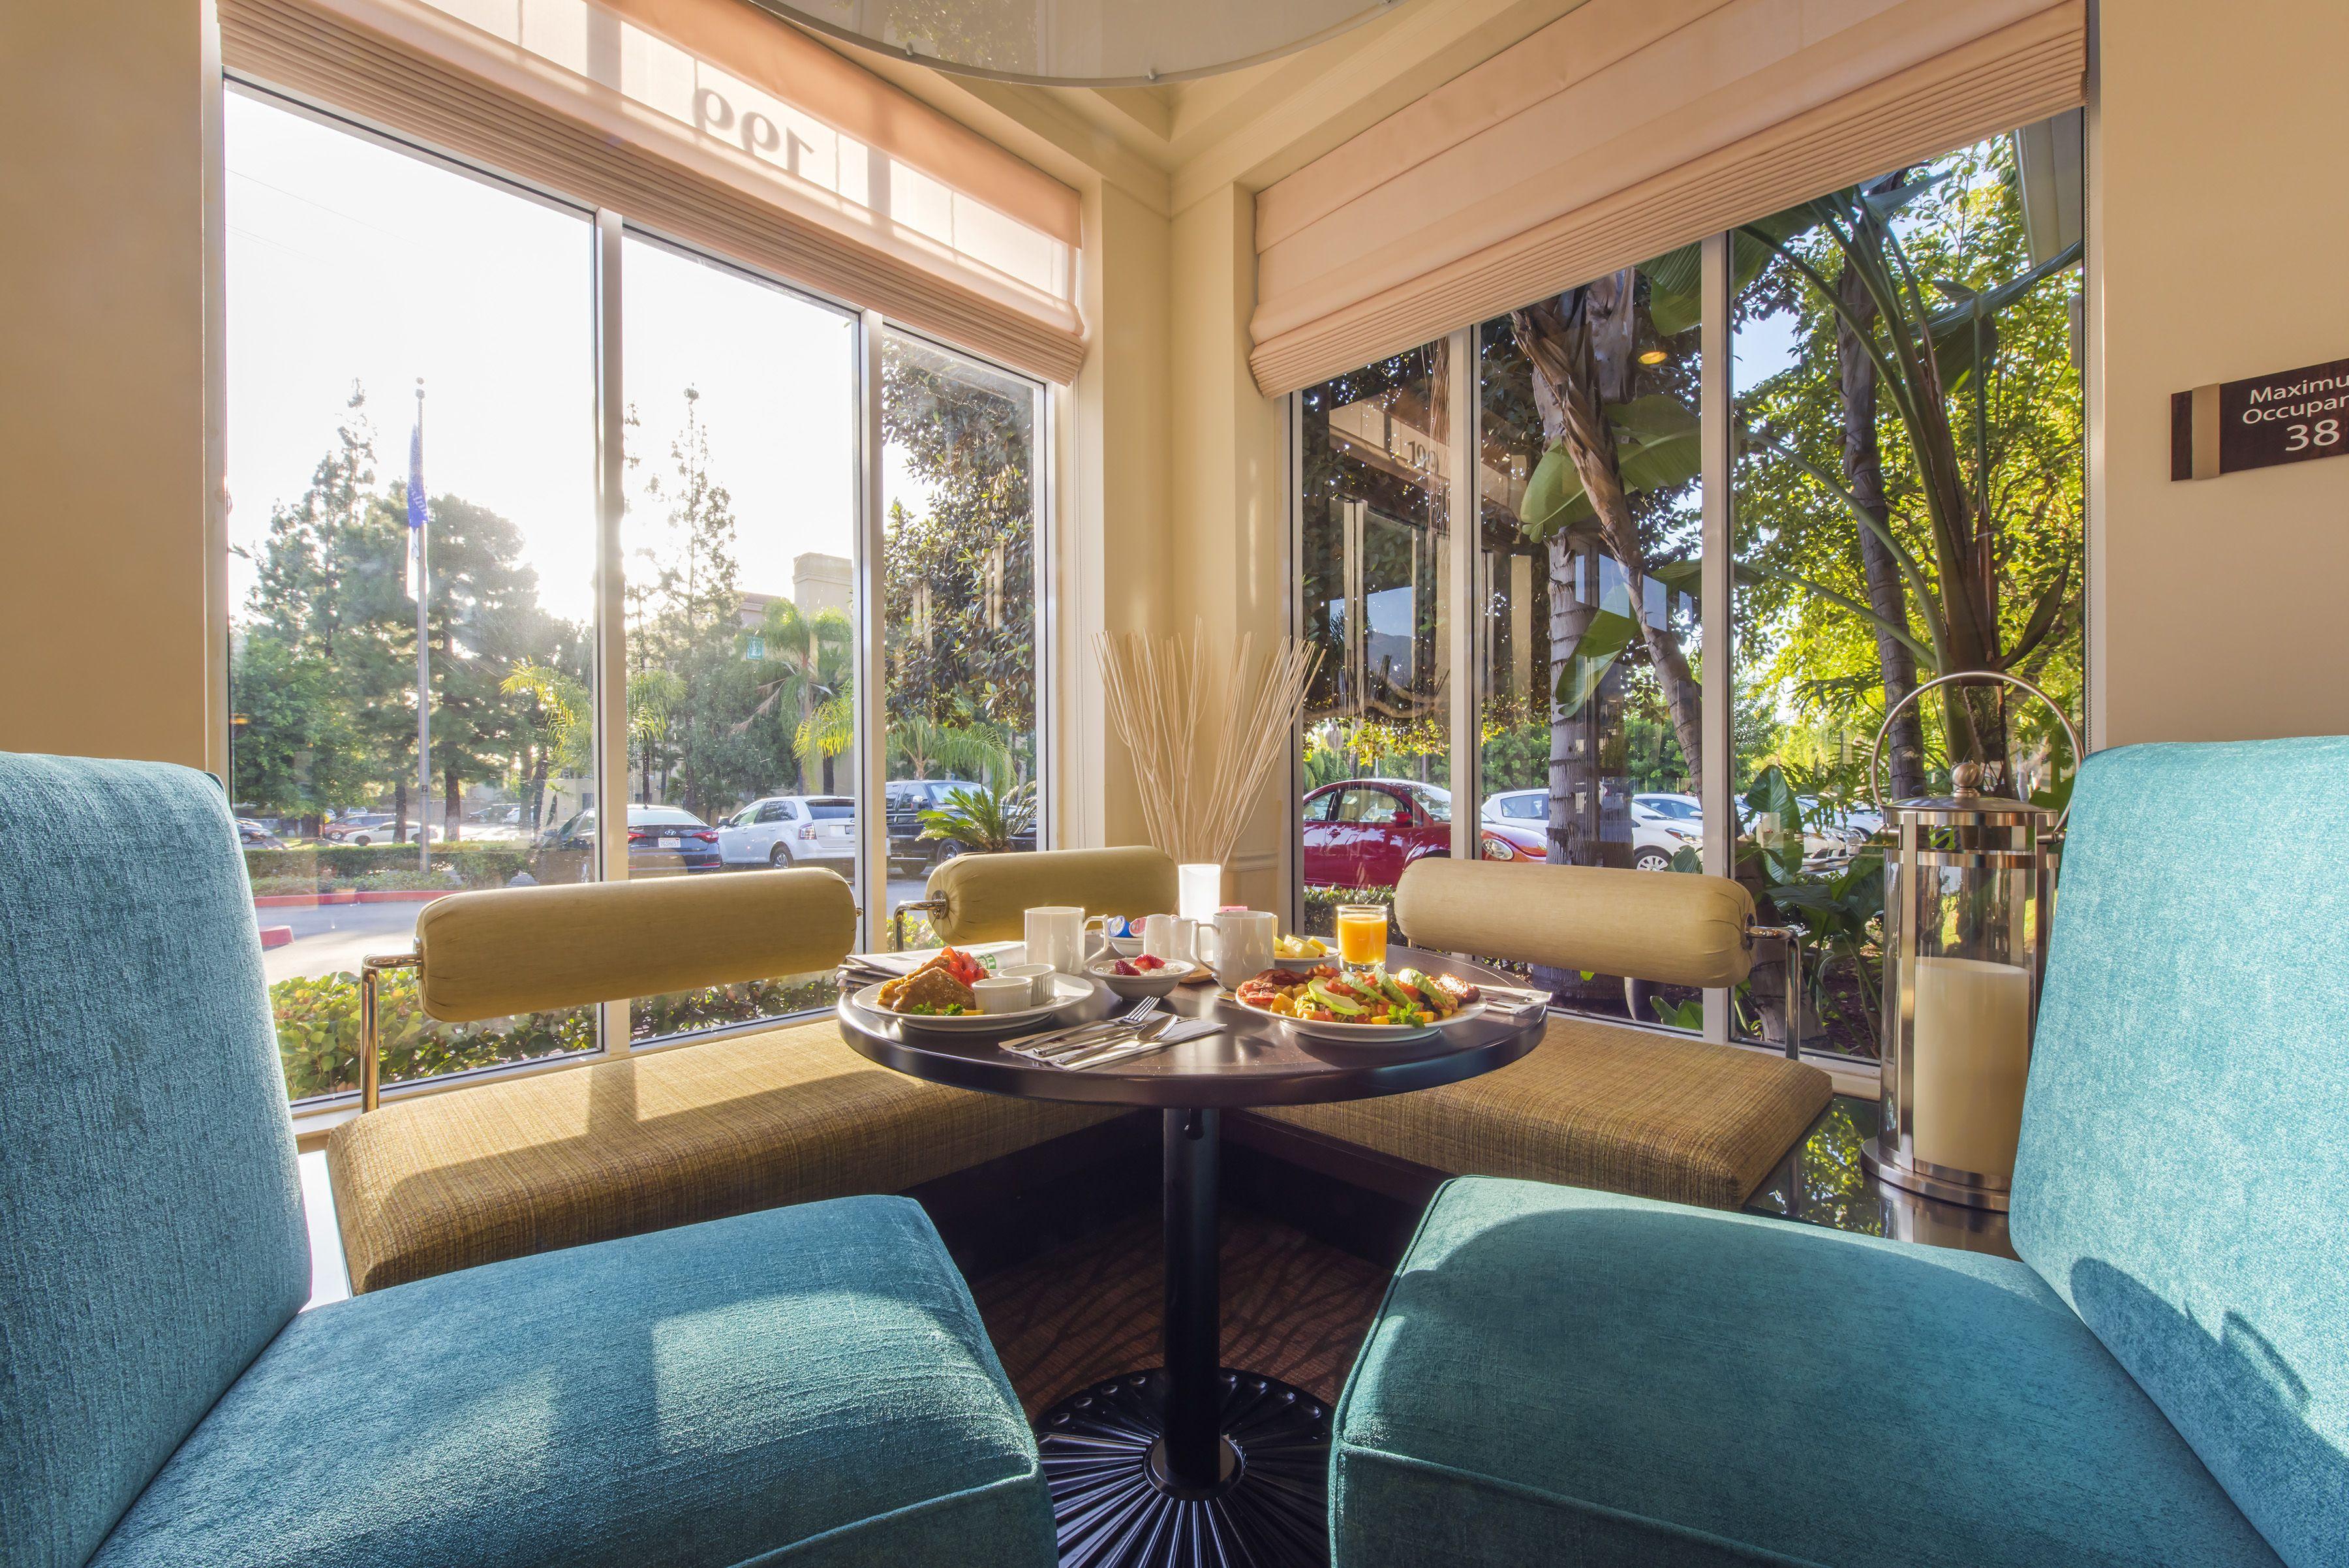 Cozy breakfast noon taking advantage of sunshine and shadows for inviting hotel photography for Hilton Garden Inn Arcadia/Pasadena.